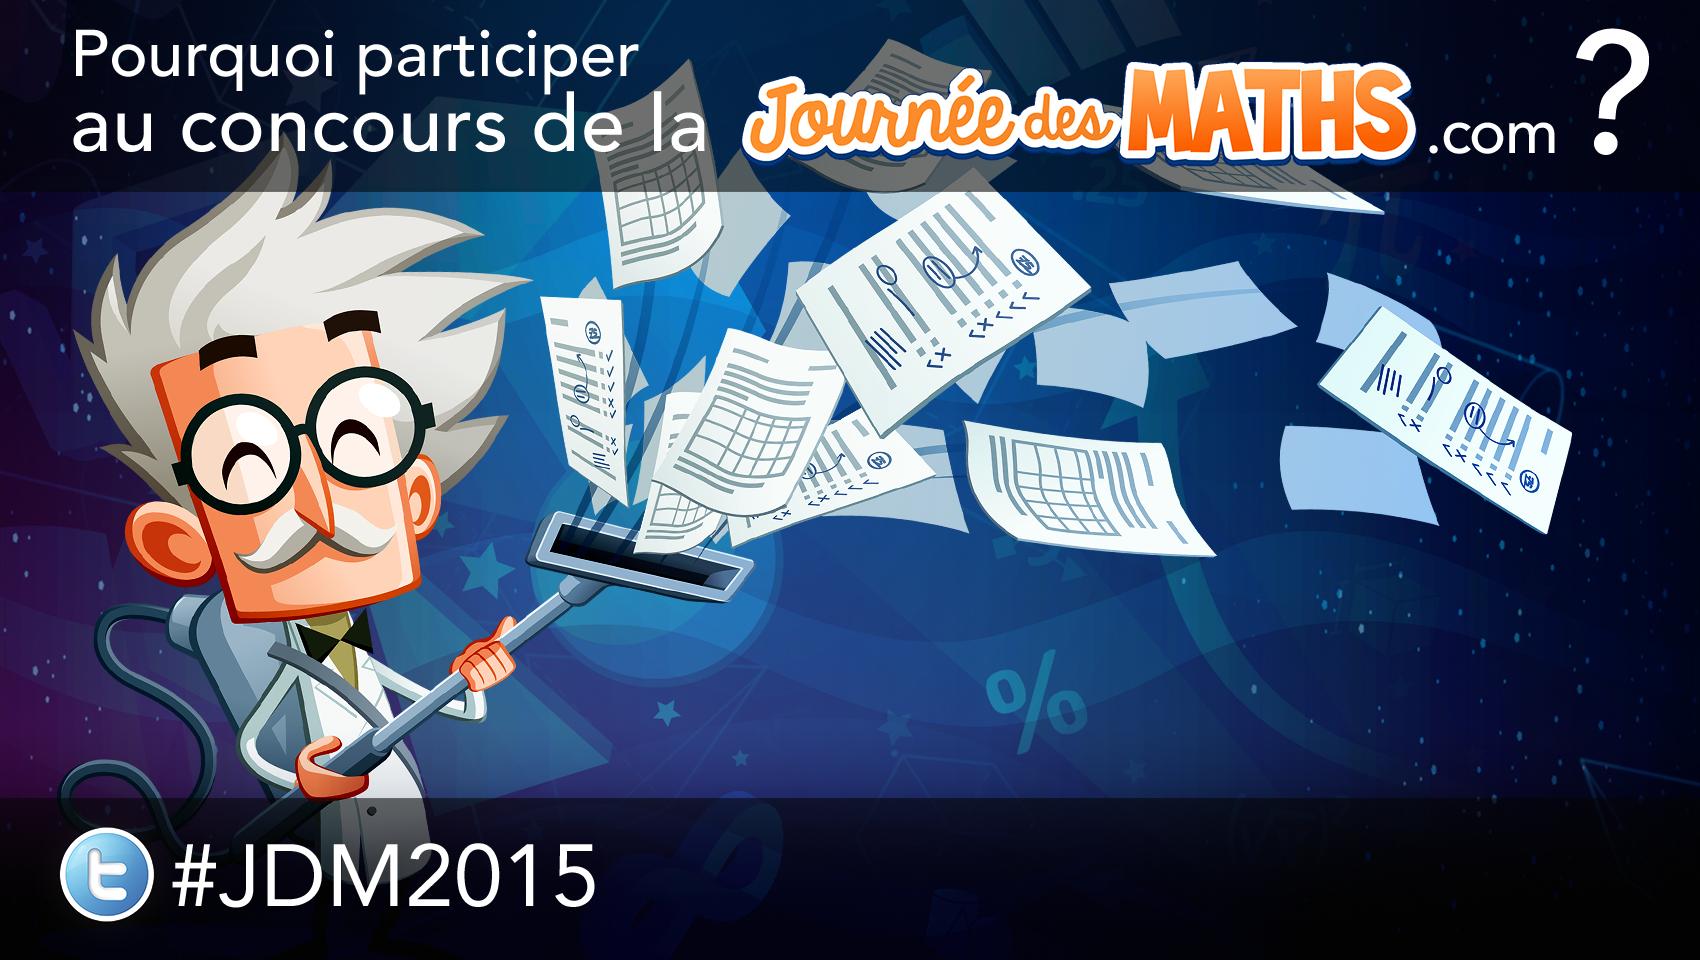 journee-des-maths-quebec-ontario-mathematiques-12